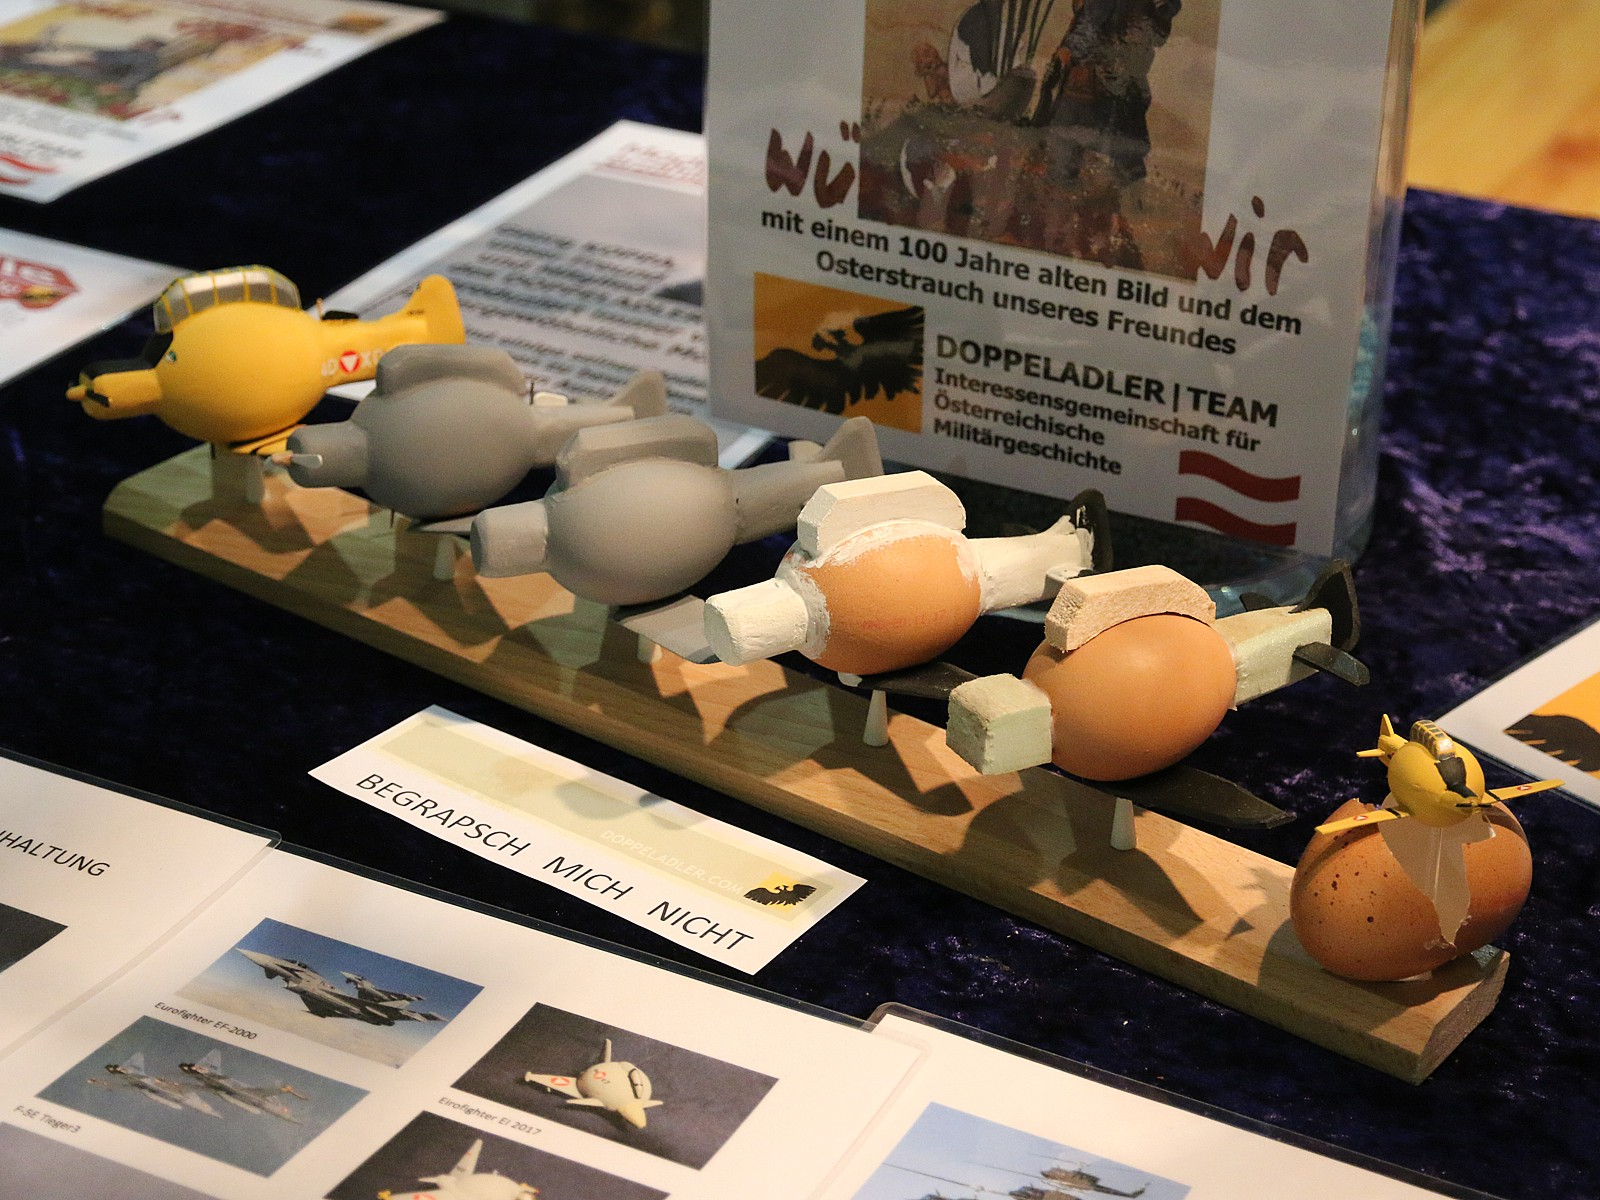 Making-Of. Ei aus Bodenhaltung, Styropor, Gips, Anbauteile © Doppeladler.com